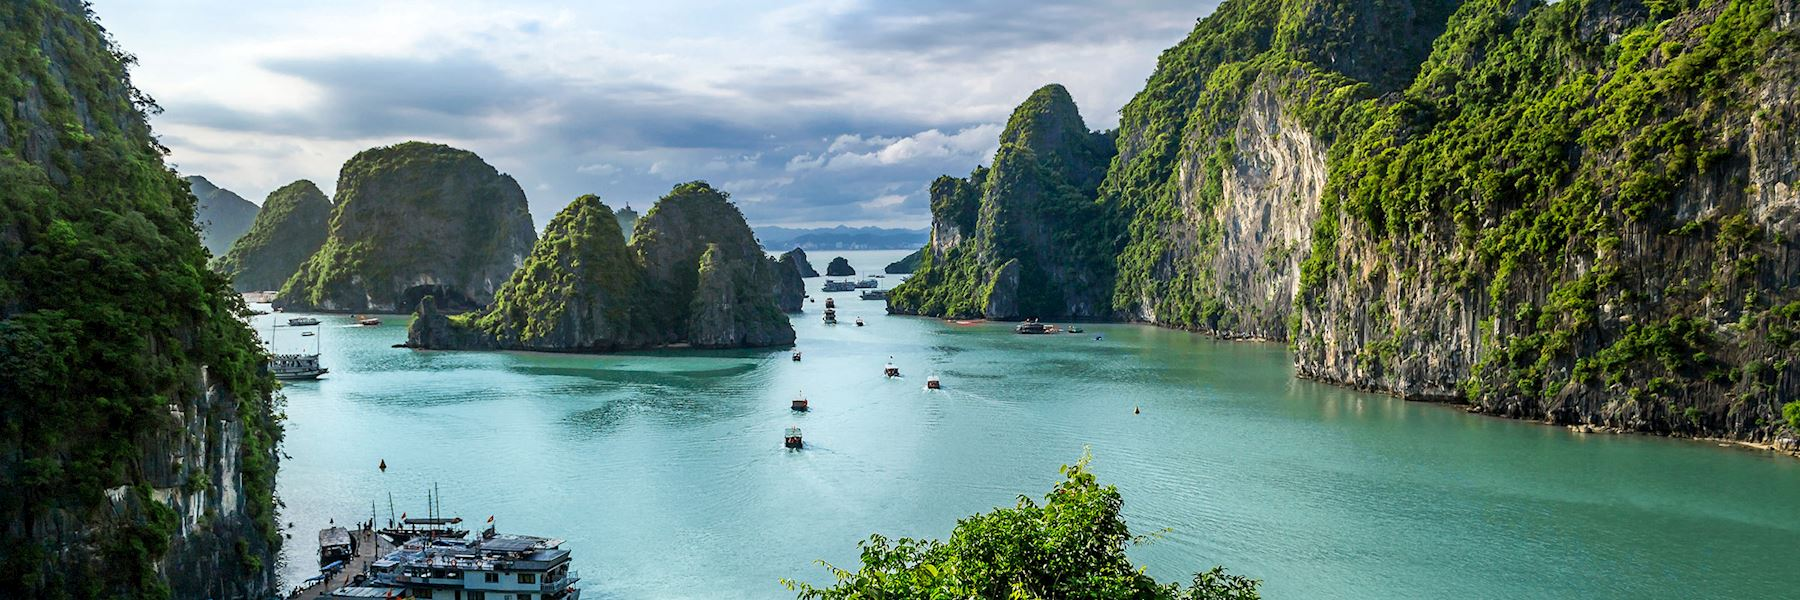 Visit Halong Bay, Vietnam